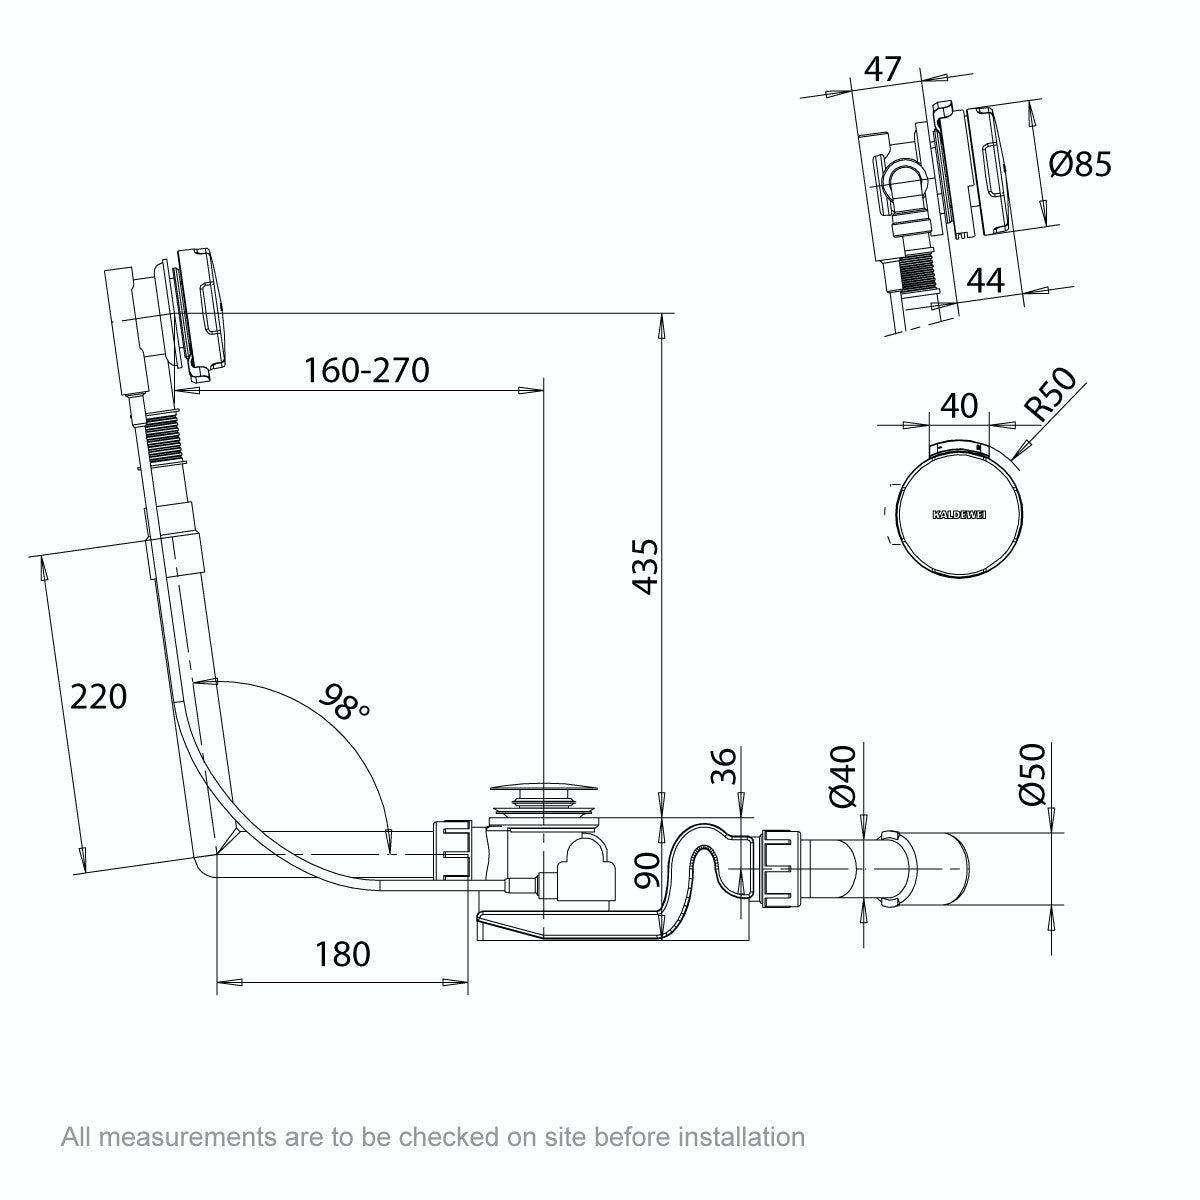 Dimensions for Kaldewei Comfort Level Plus standard bath waste filler and overflow set